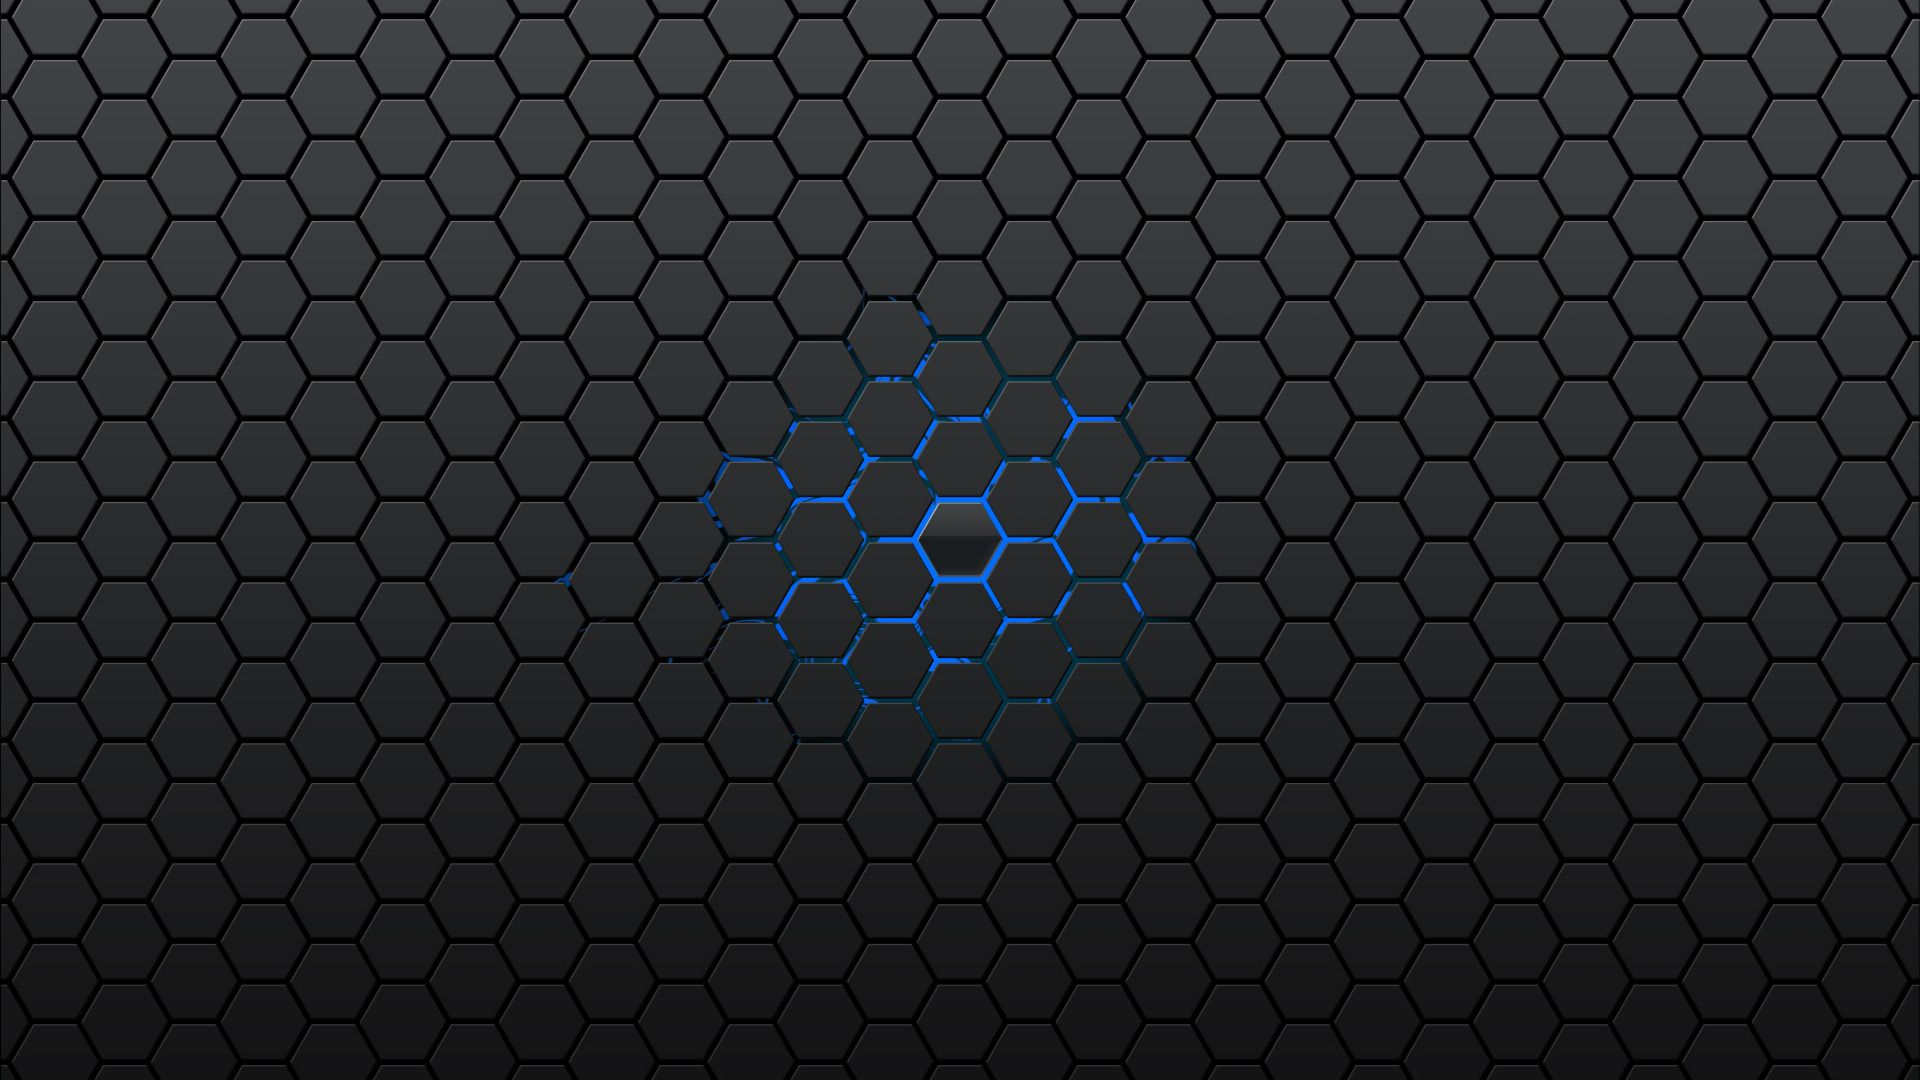 Wallpapers Minimalistas 1080p Hexagon Wallpaper Abstract